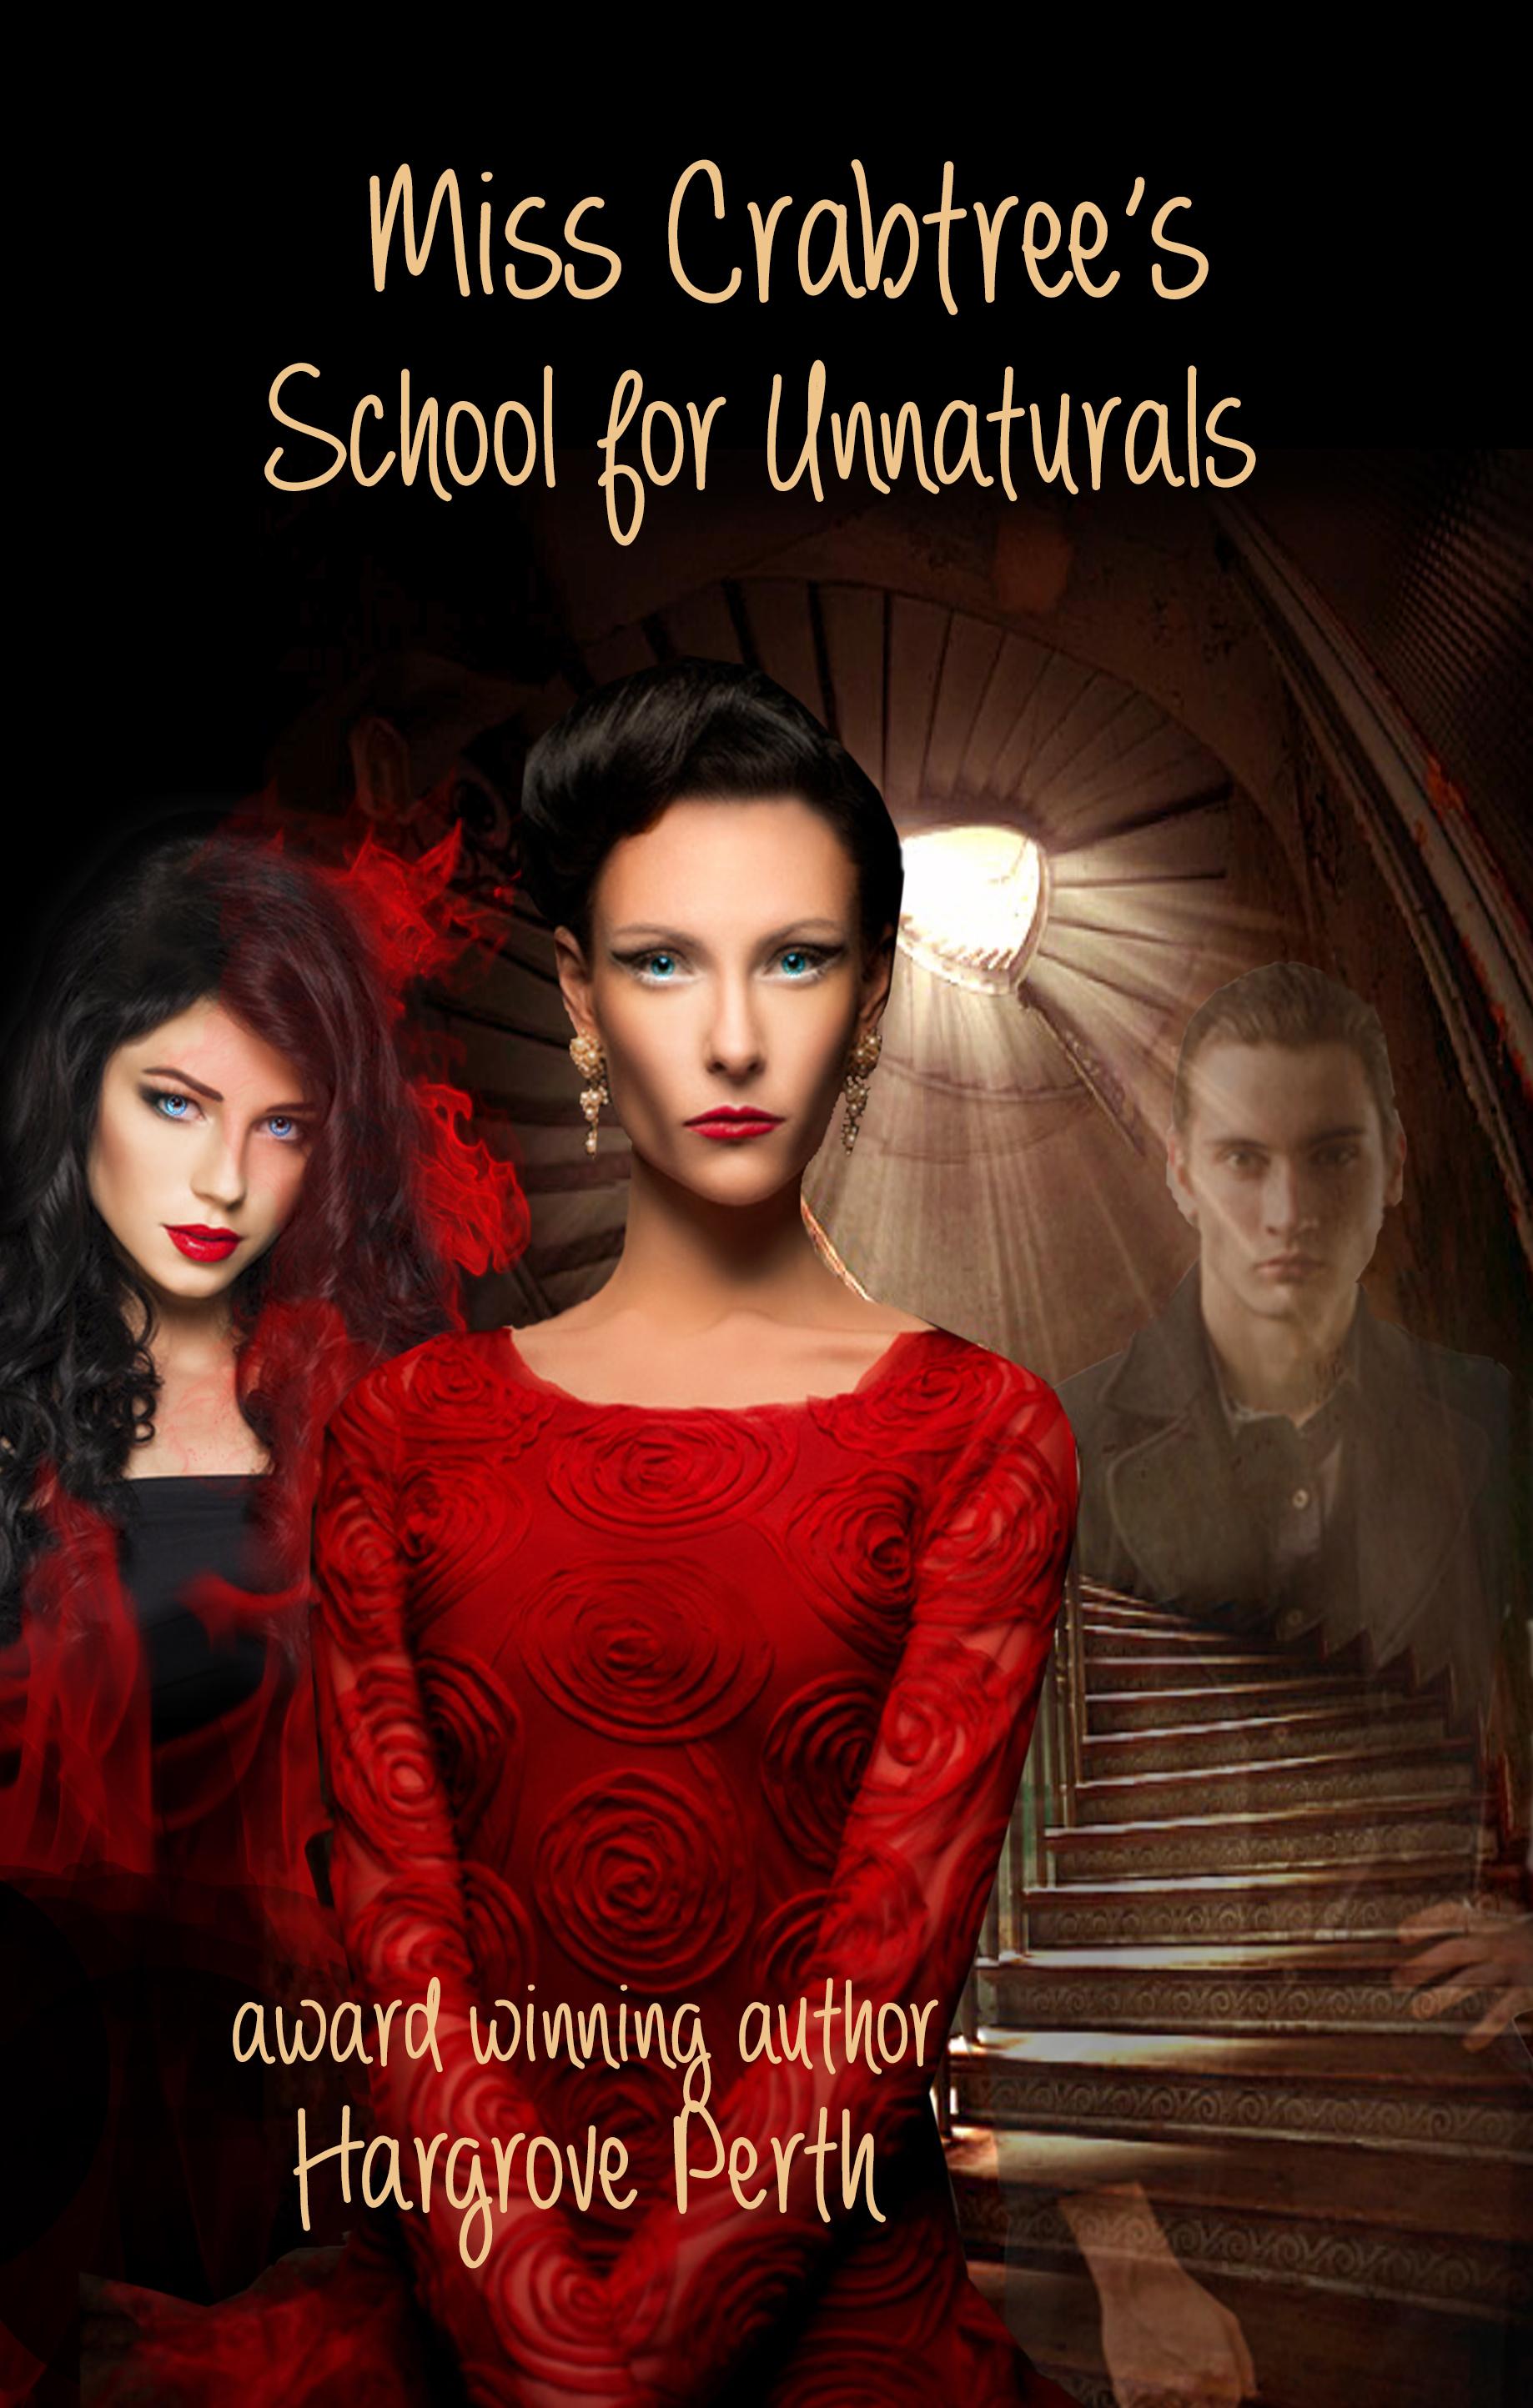 Miss Crabtrees School for Unnaturals Hargrove Perth